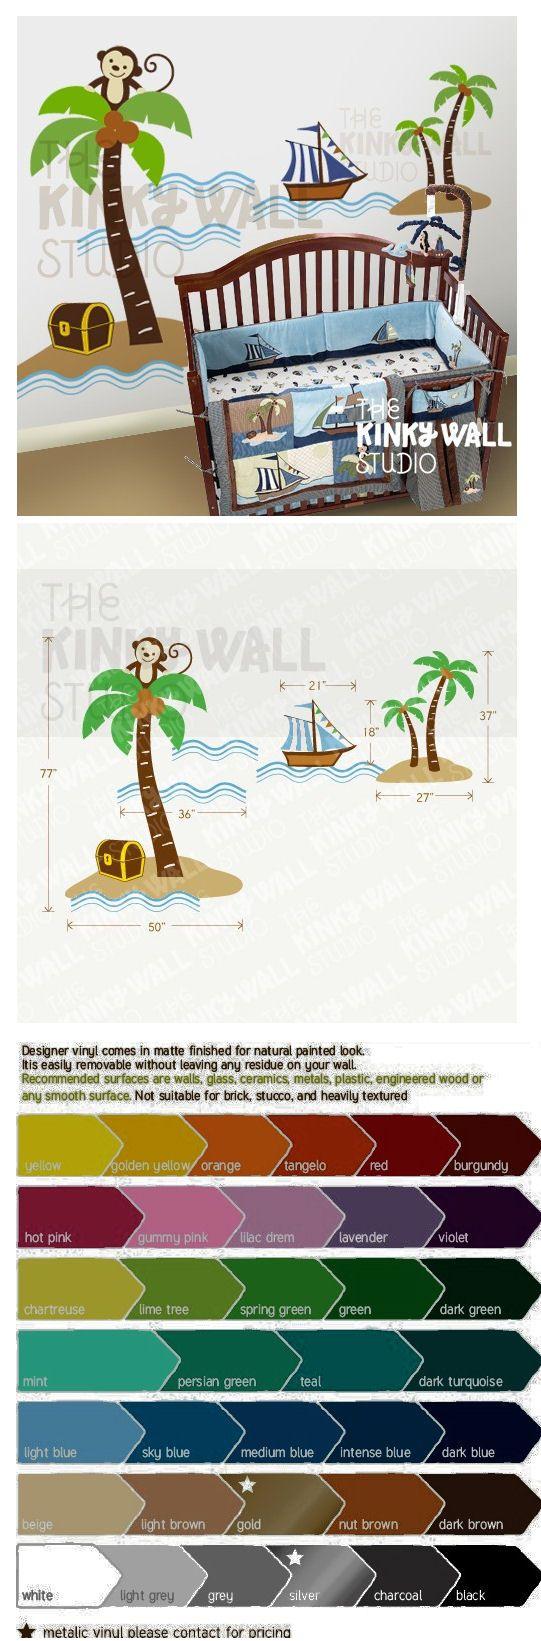 45 best beach wall decals images on pinterest sticker wall ahoy matey breezy beach wall decals wall sticker outlet